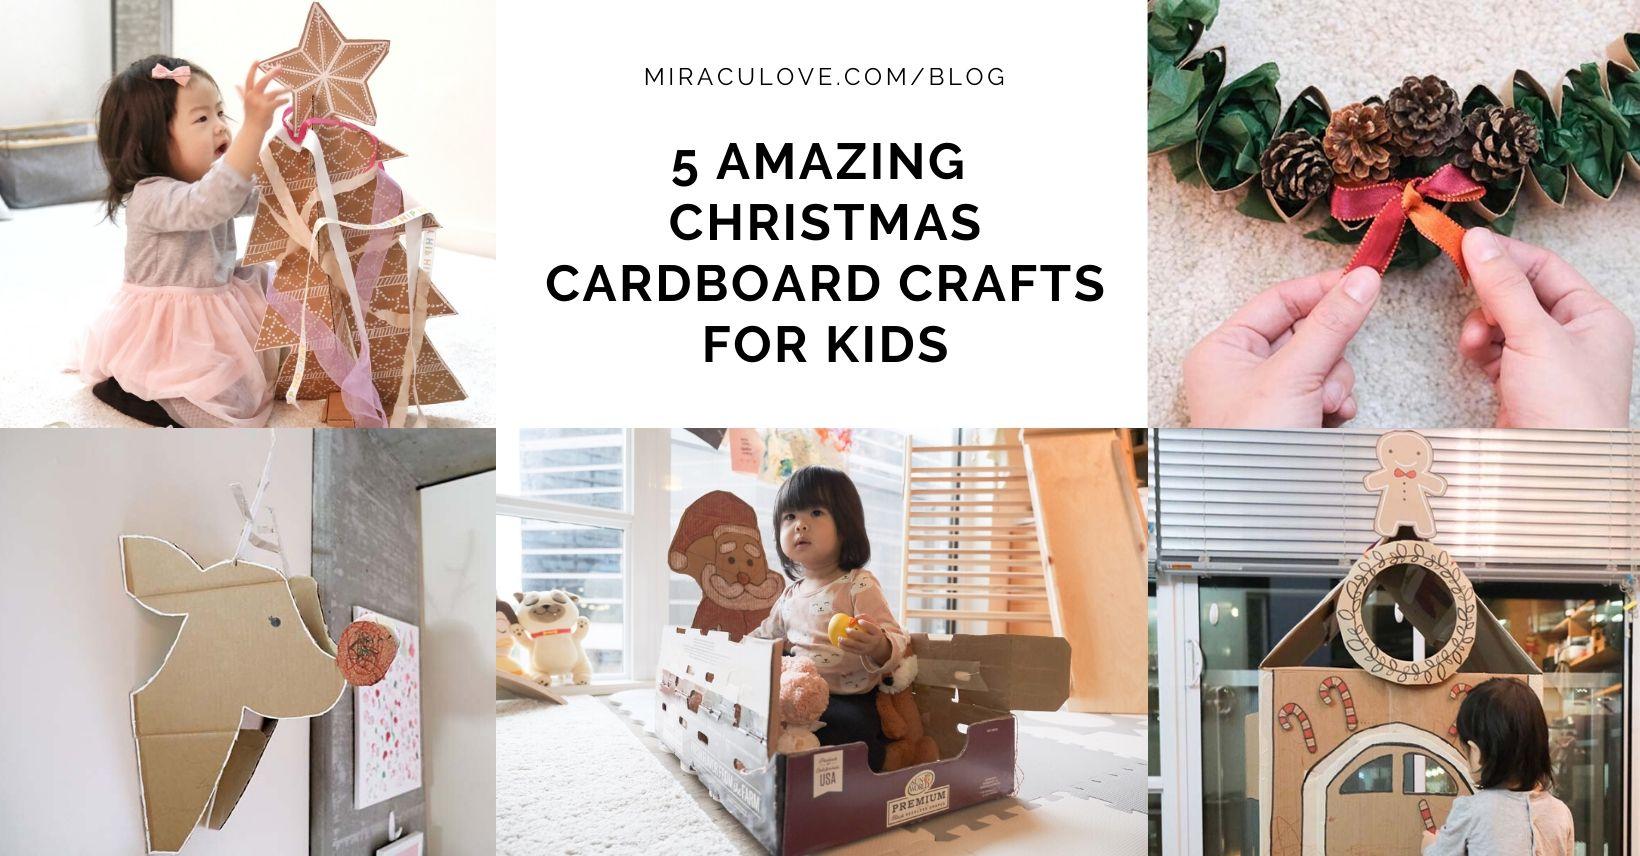 5 Amazing DIY Christmas Cardboard Crafts for Kids